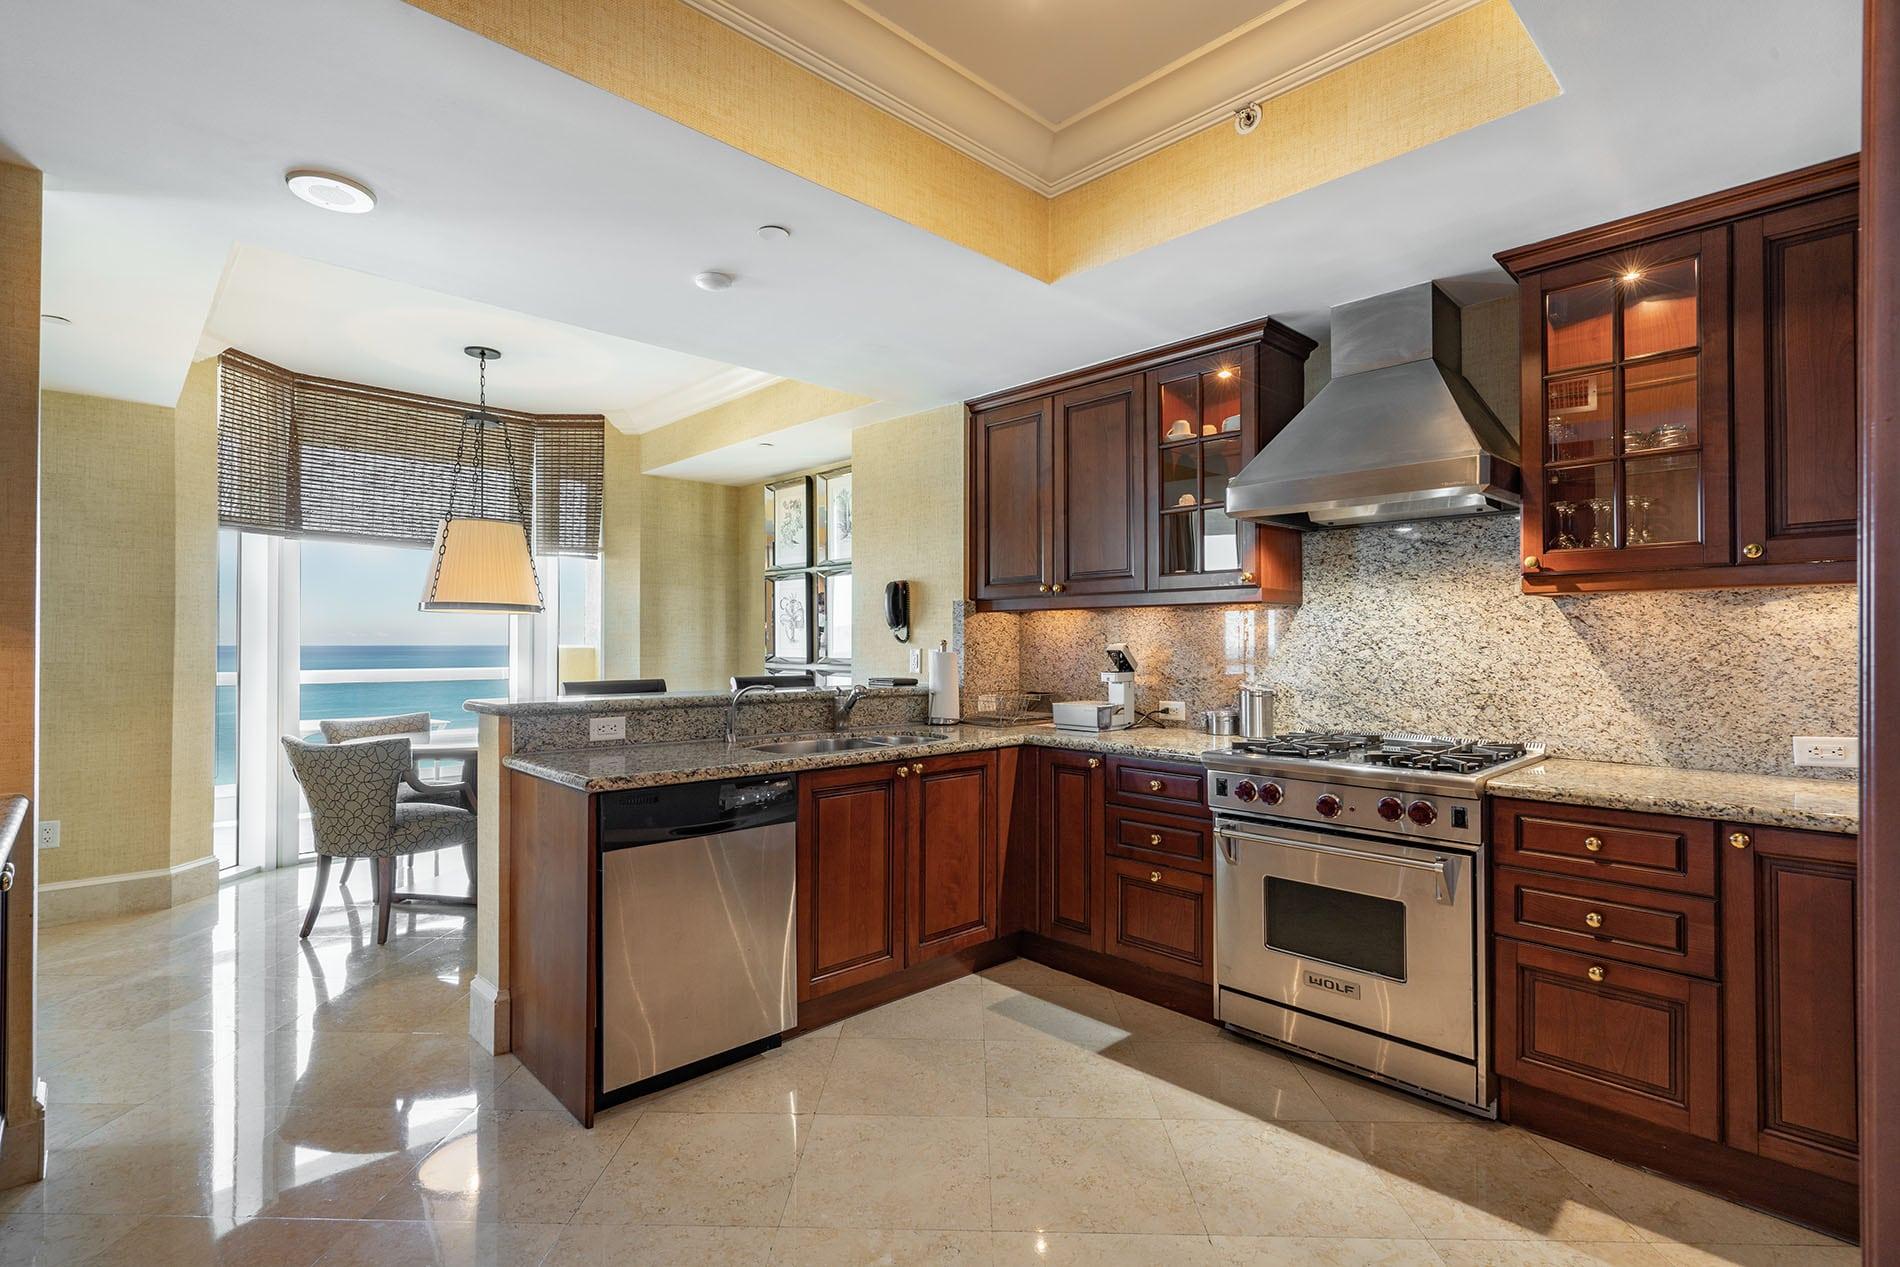 Acqualina Miami kitchen